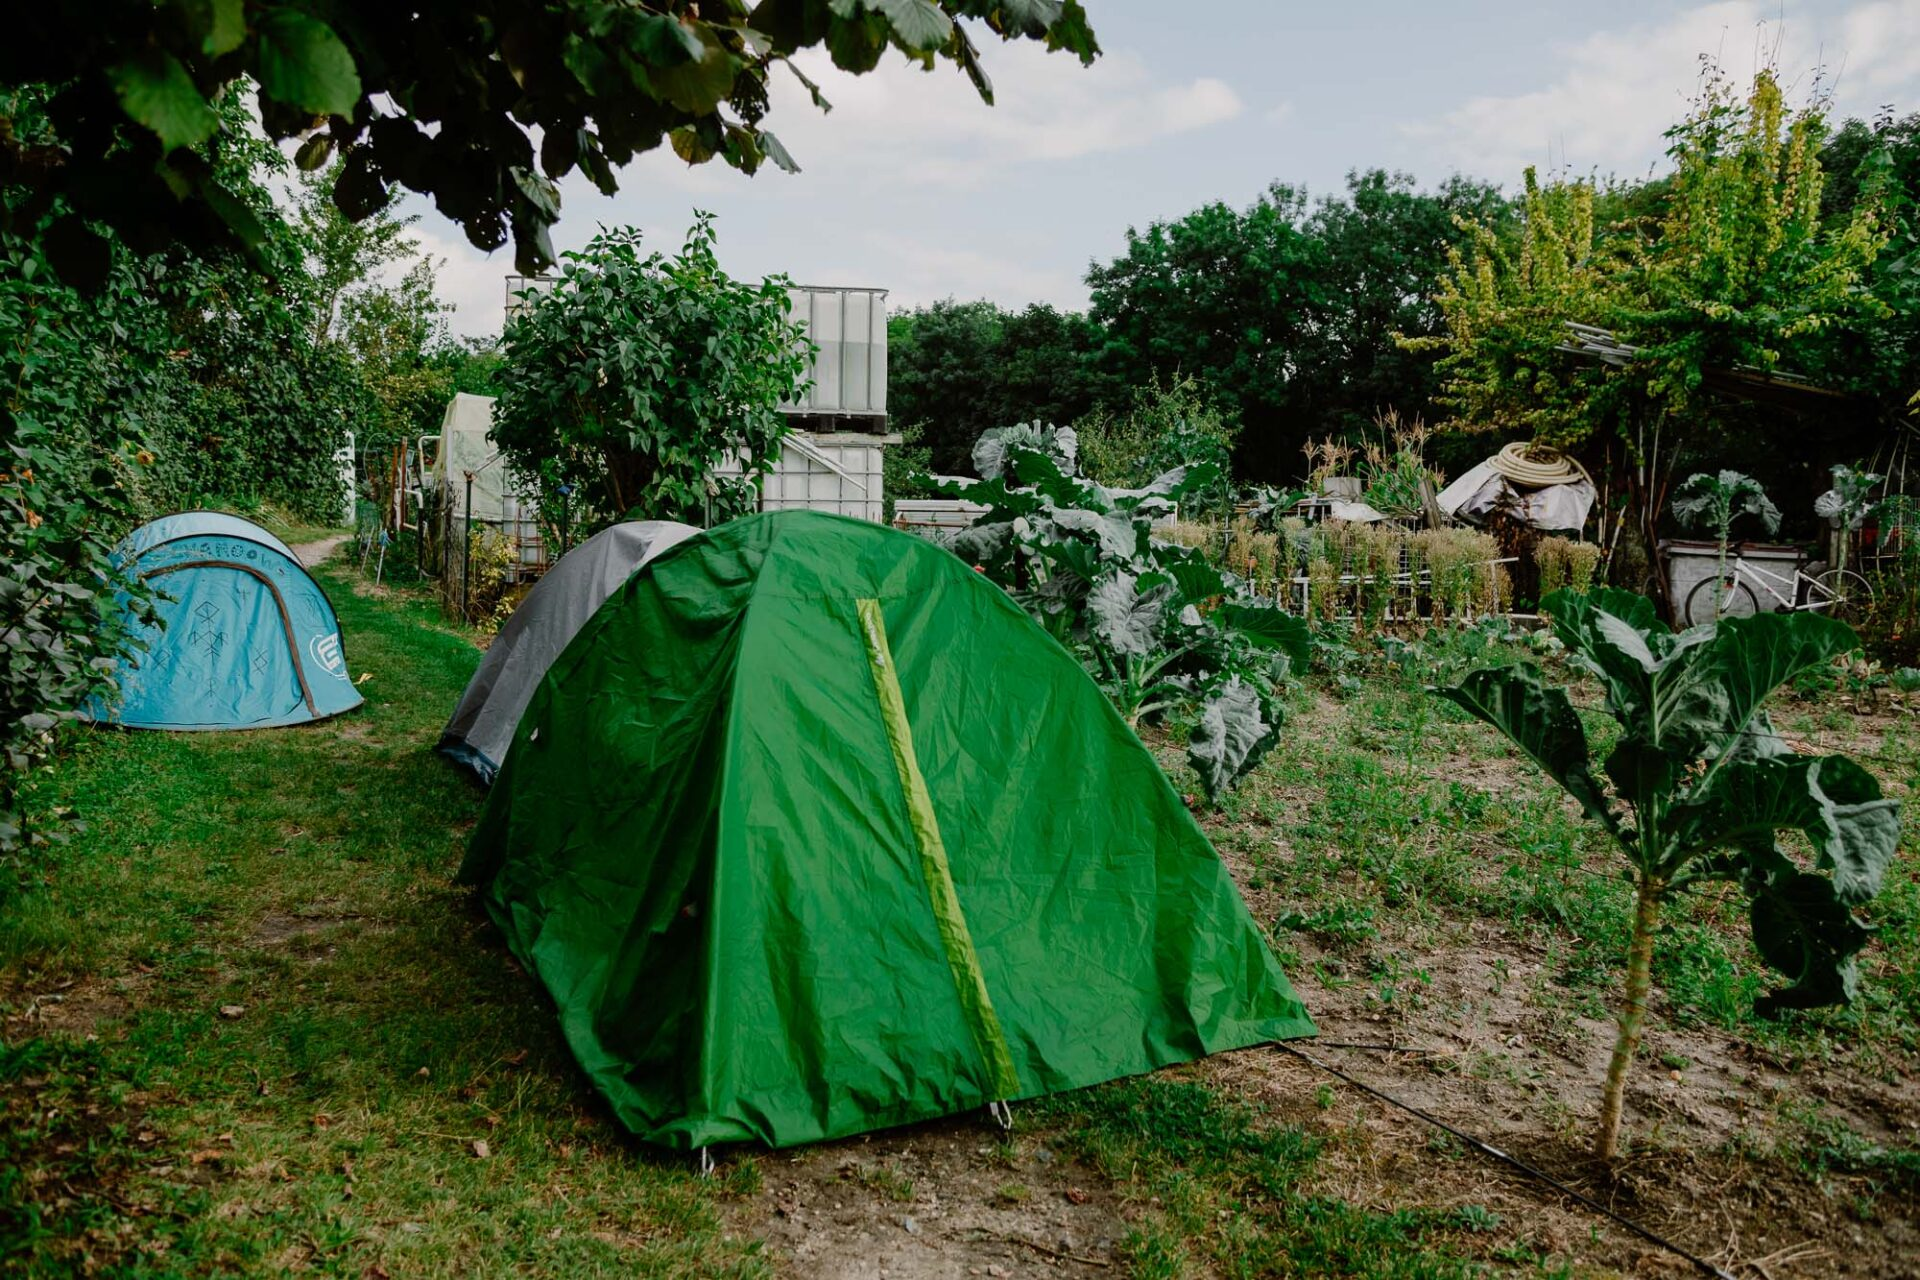 Jardins ouvriers aubervilliers 23 - Dagmara Bojenko - Eco-conscious Weddings, Births & Families